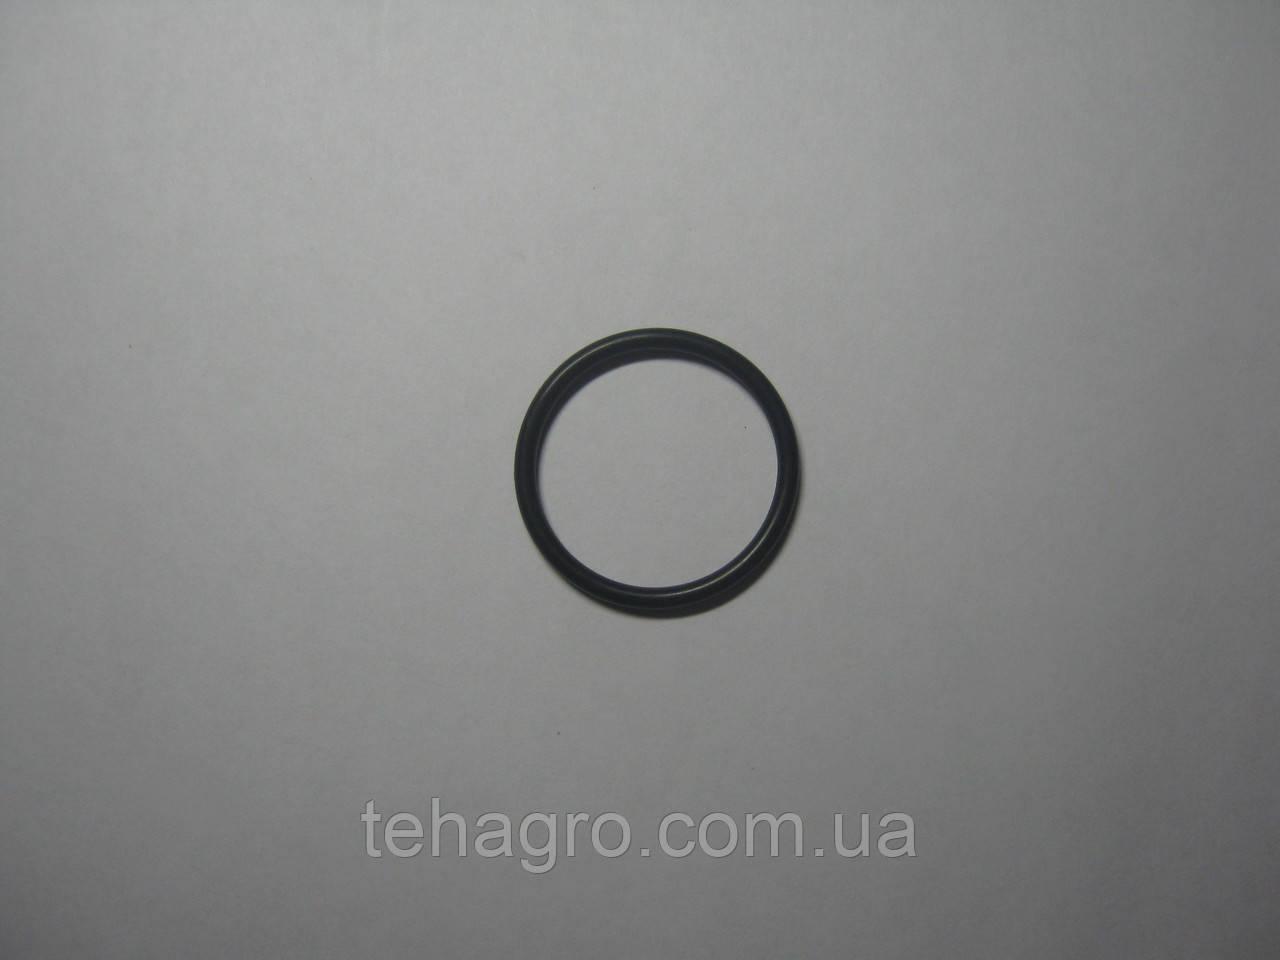 Кольцо уплотнительное (кільце ущільнююче) 28,25*2,62